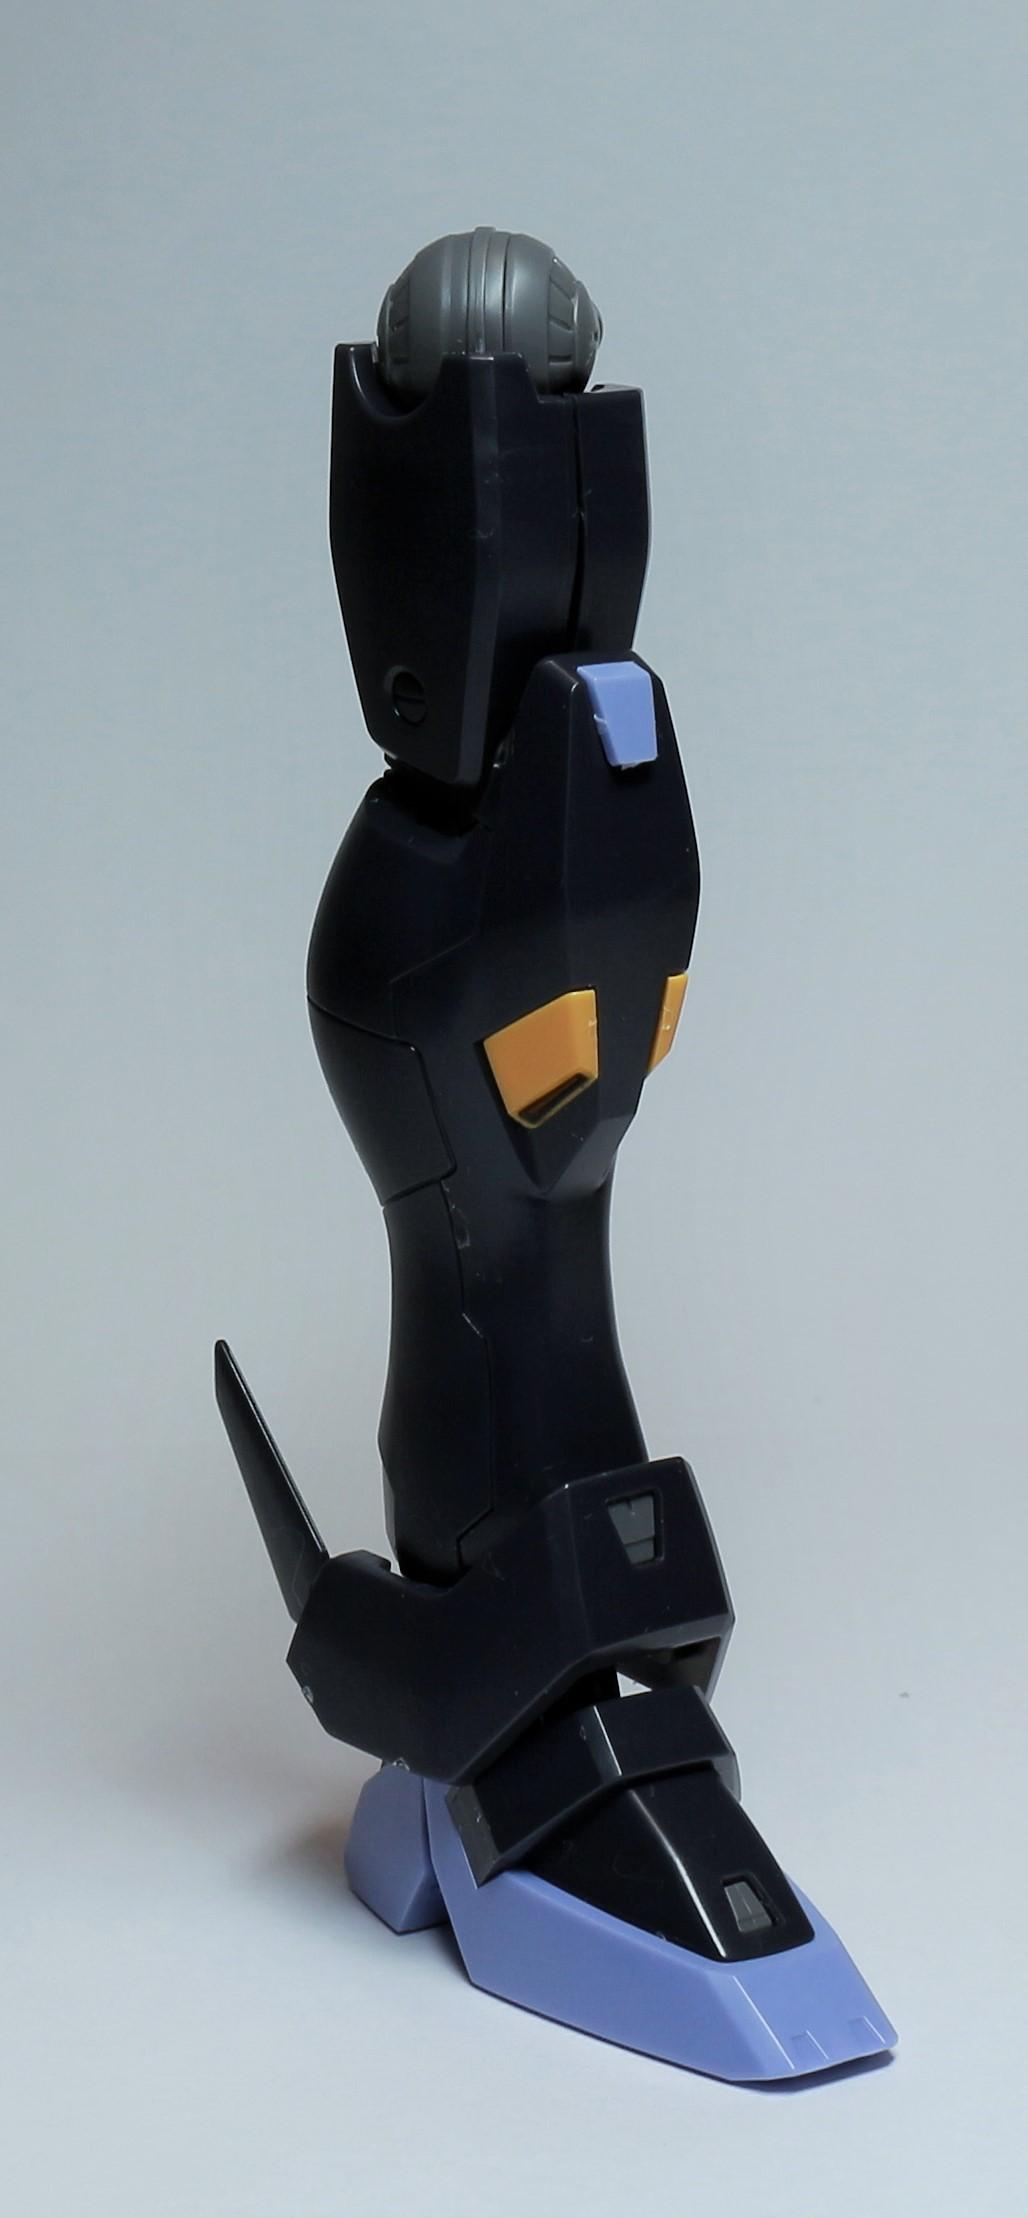 MG-CrossBone_X2_Custom-100.jpg